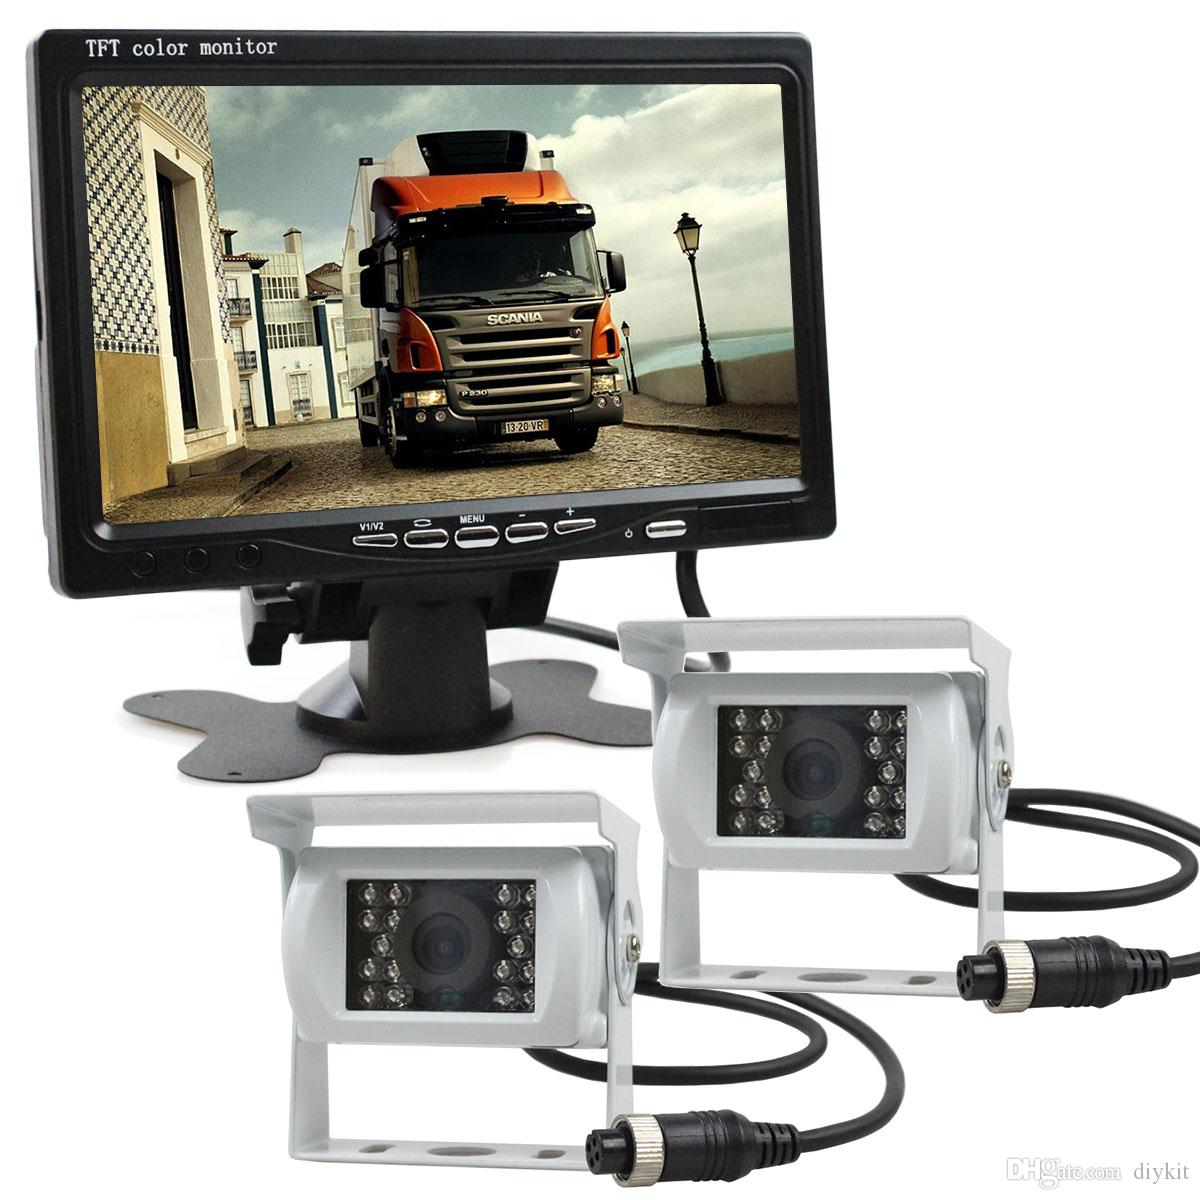 2 x 4pin Night Vision Rear View Camera Car Camera + DC 12V-24V 7 inch TFT LCD Car Monitor System for Bus Houseboat Truck